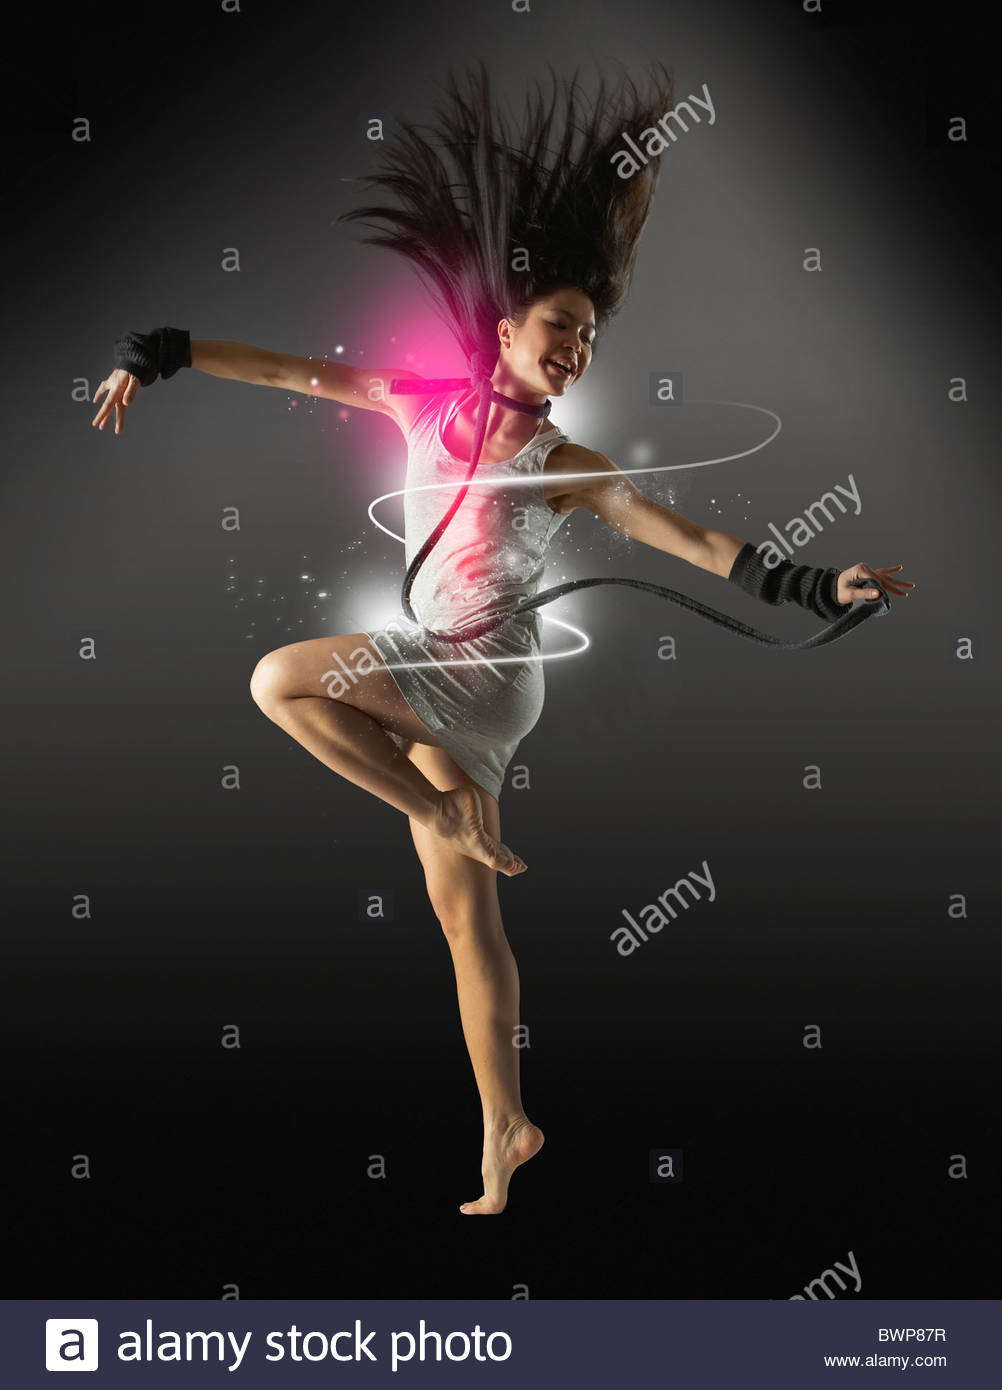 Glamorous woman dancing - Stock Image